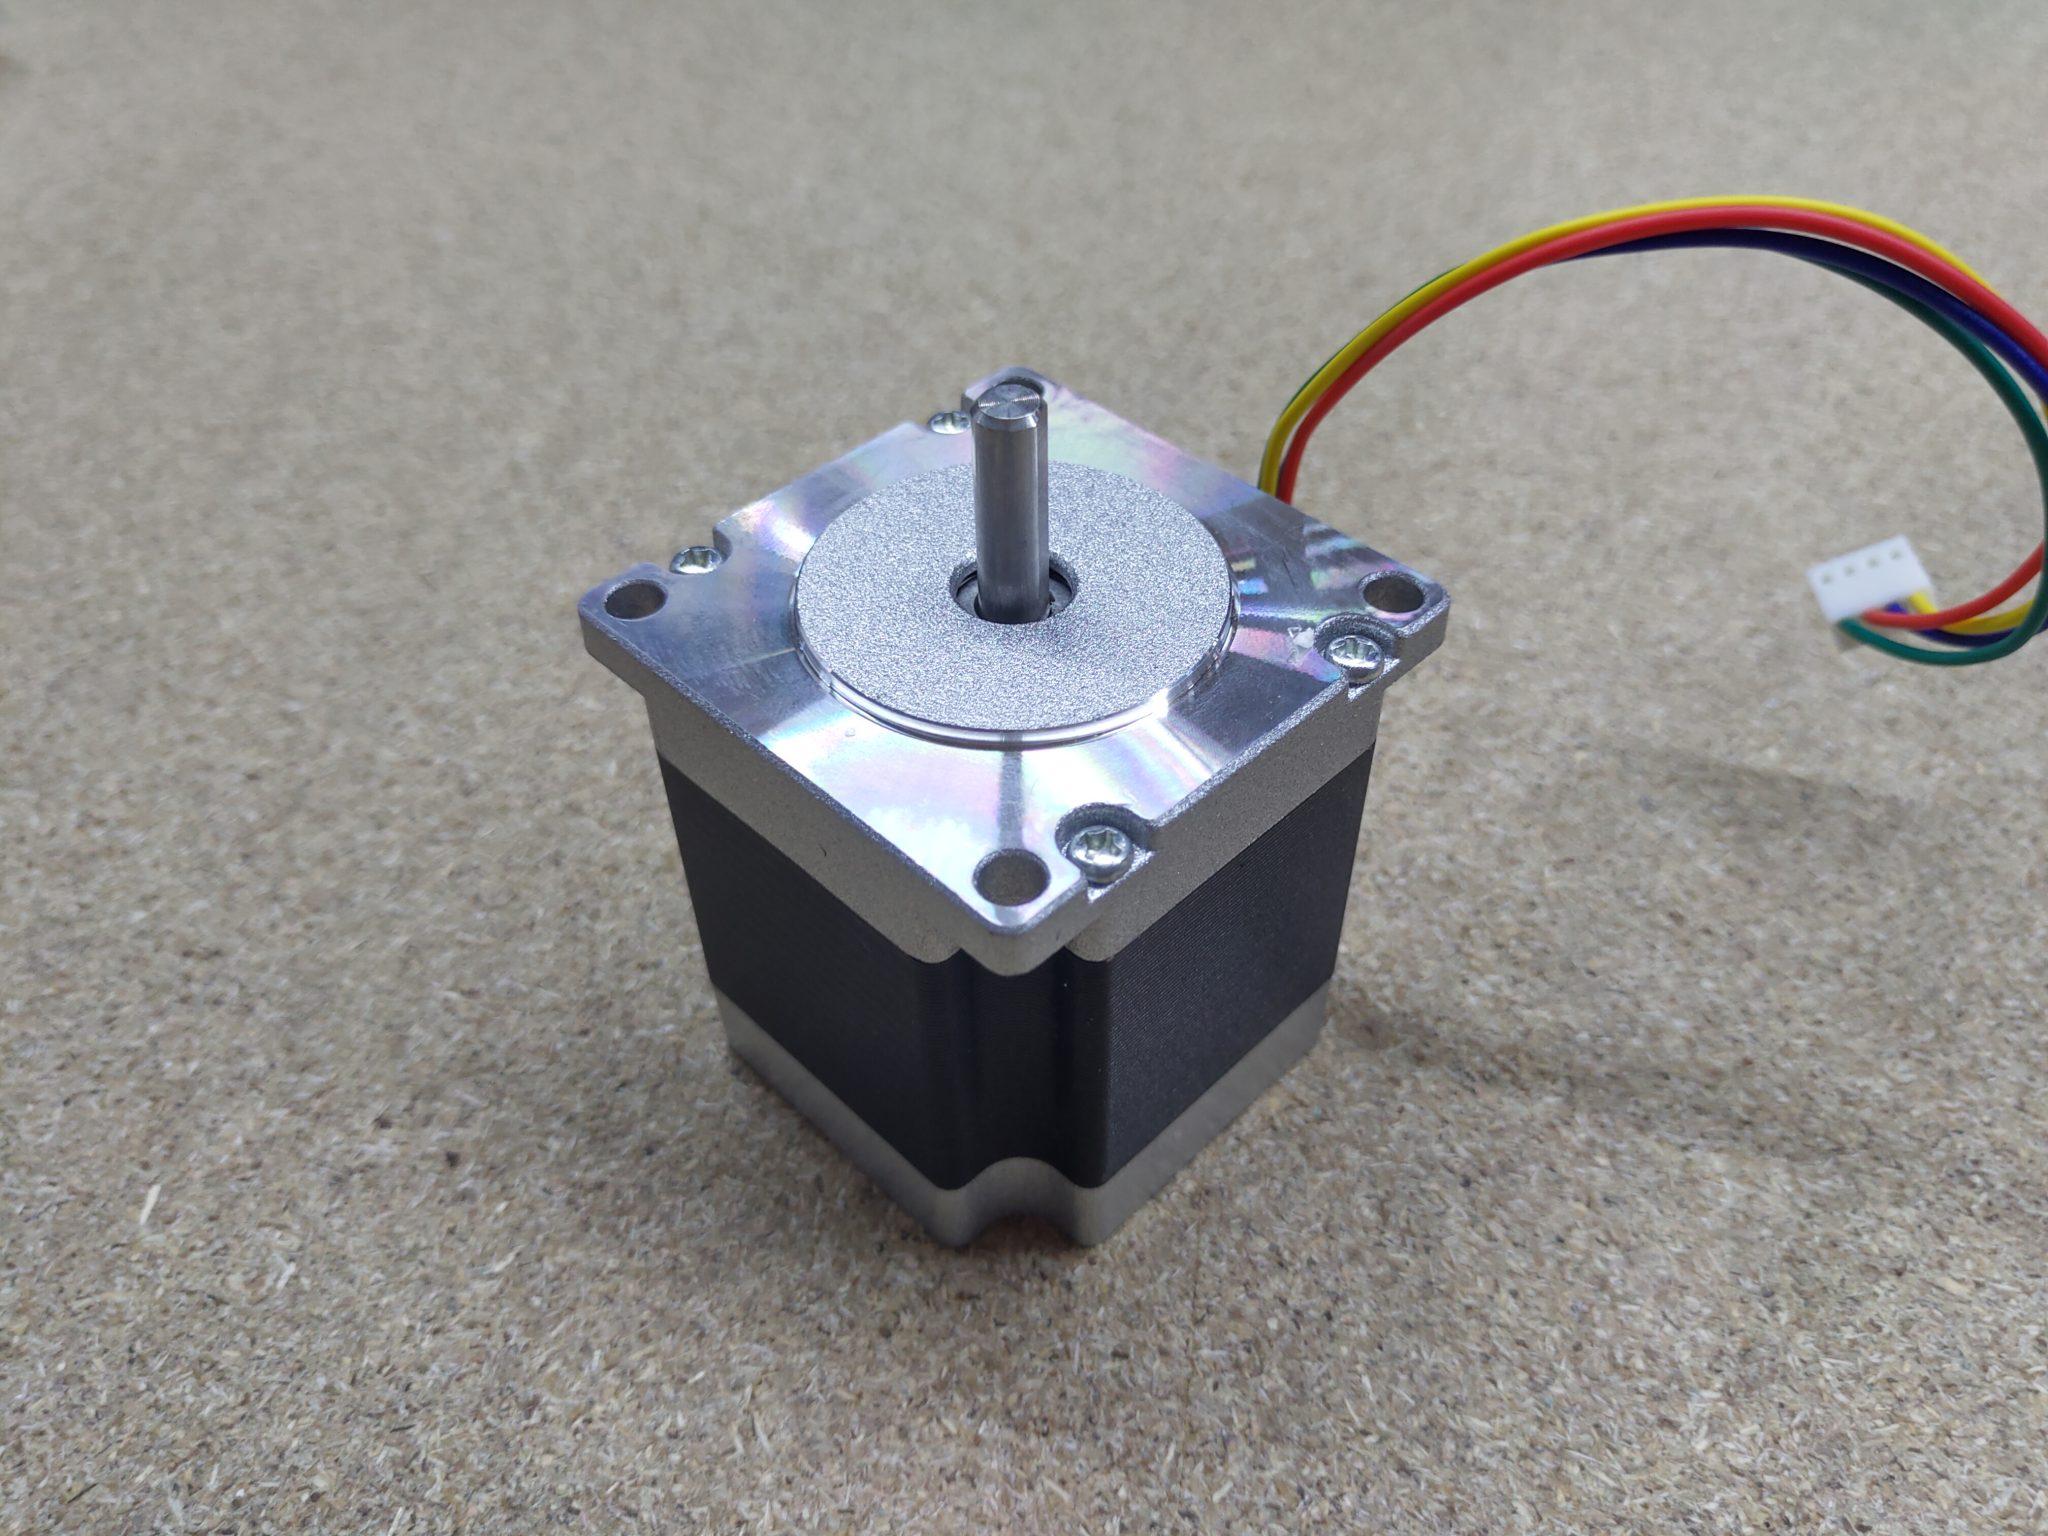 Phrozen Shuffle XL Steppermotor